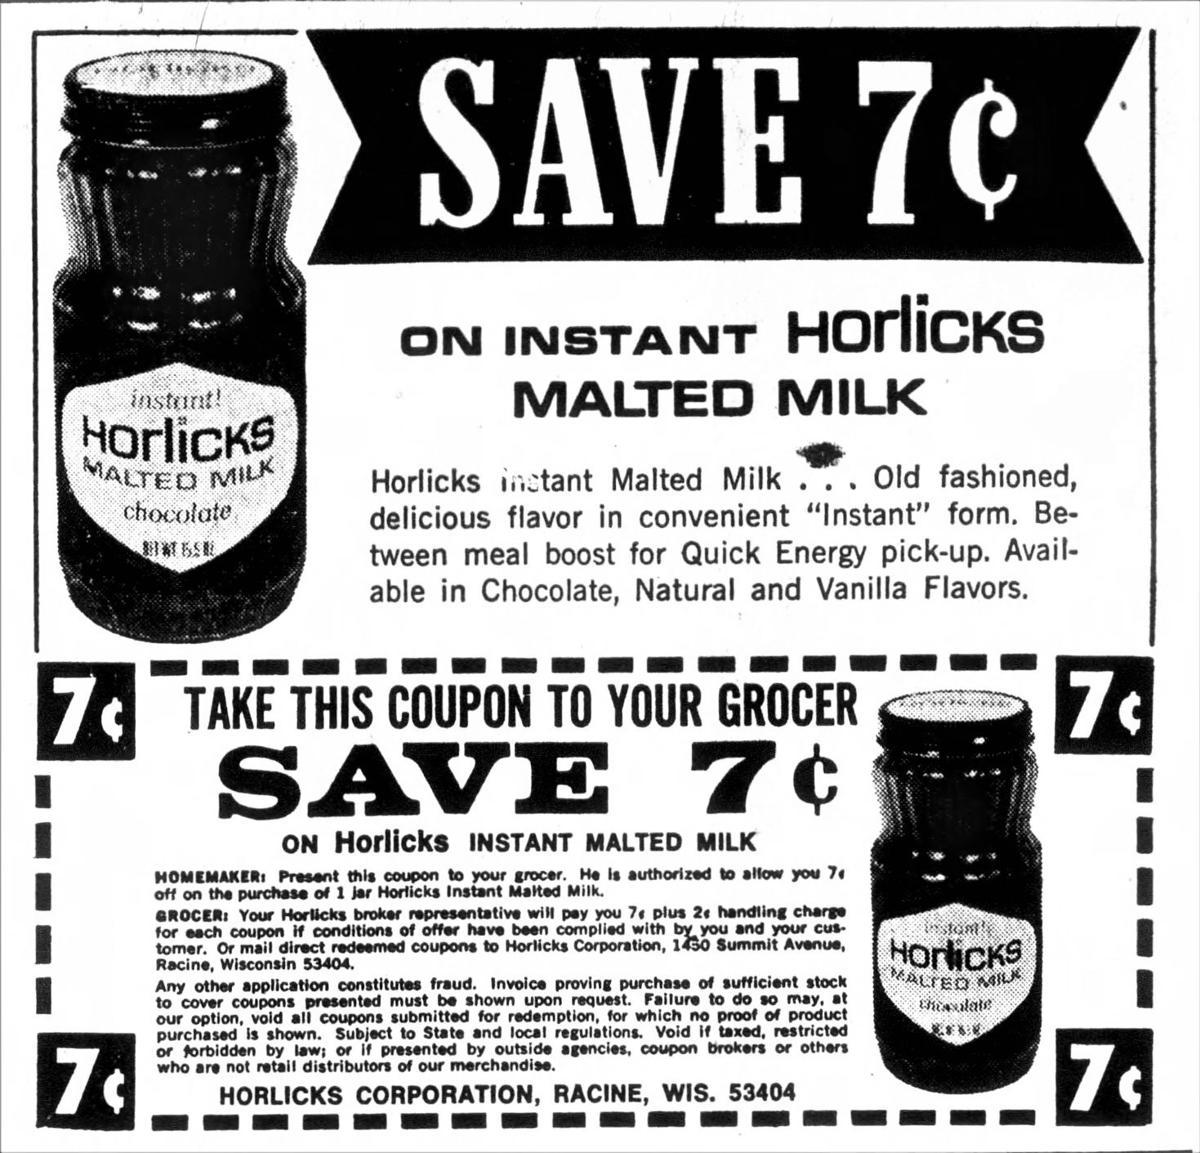 Horlick's Malted Milk ad, February 1969